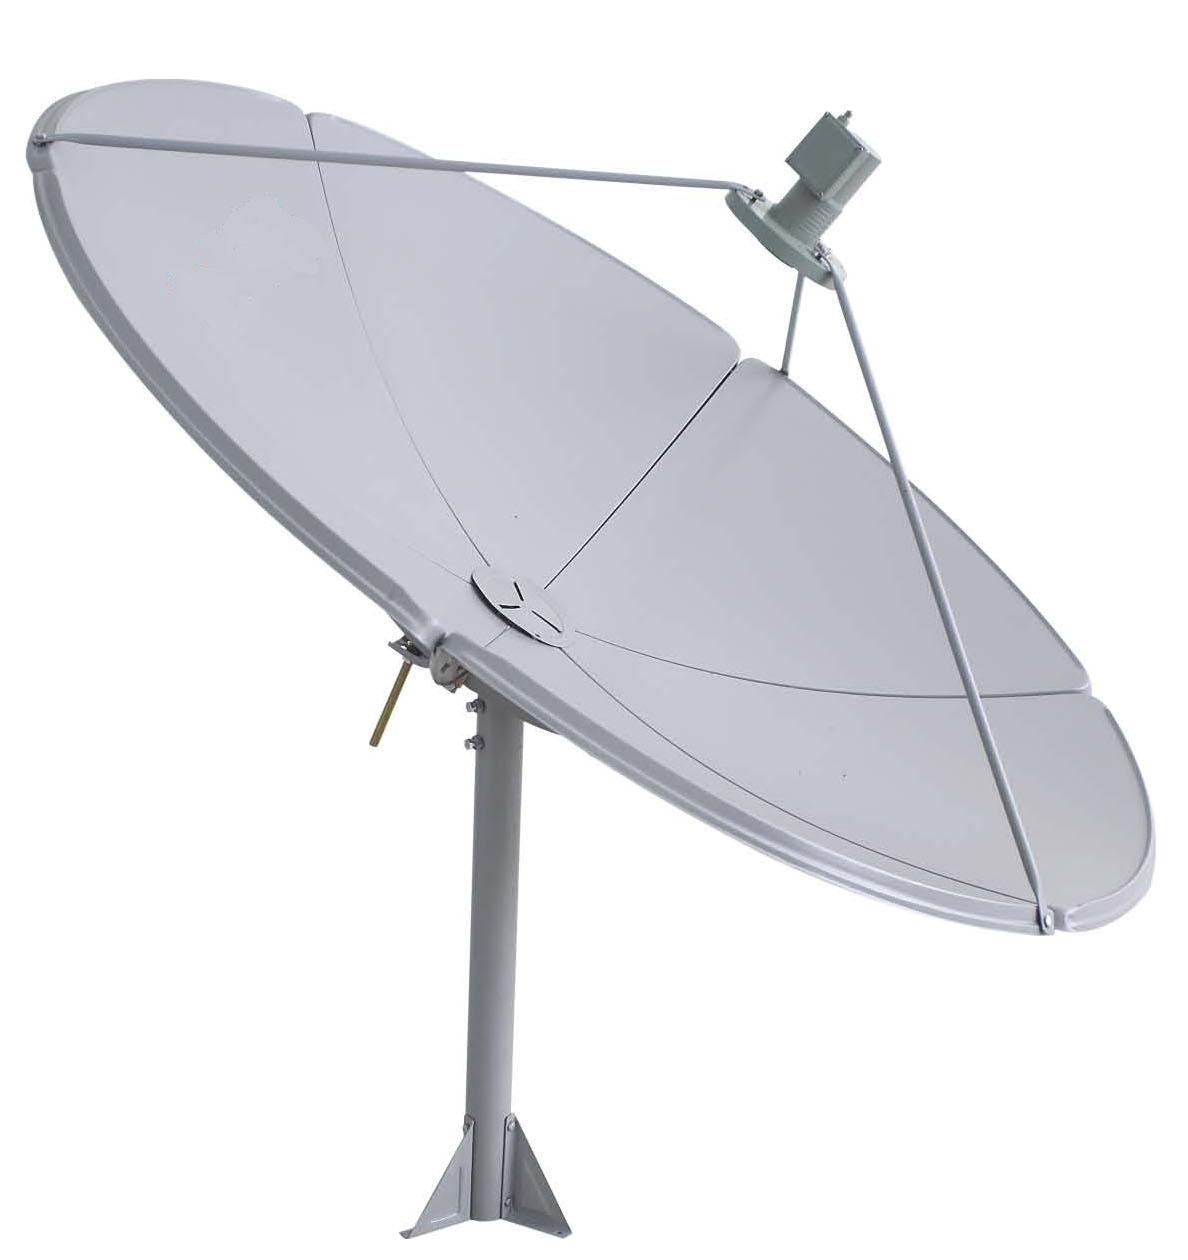 Space Satellite Png image #40918